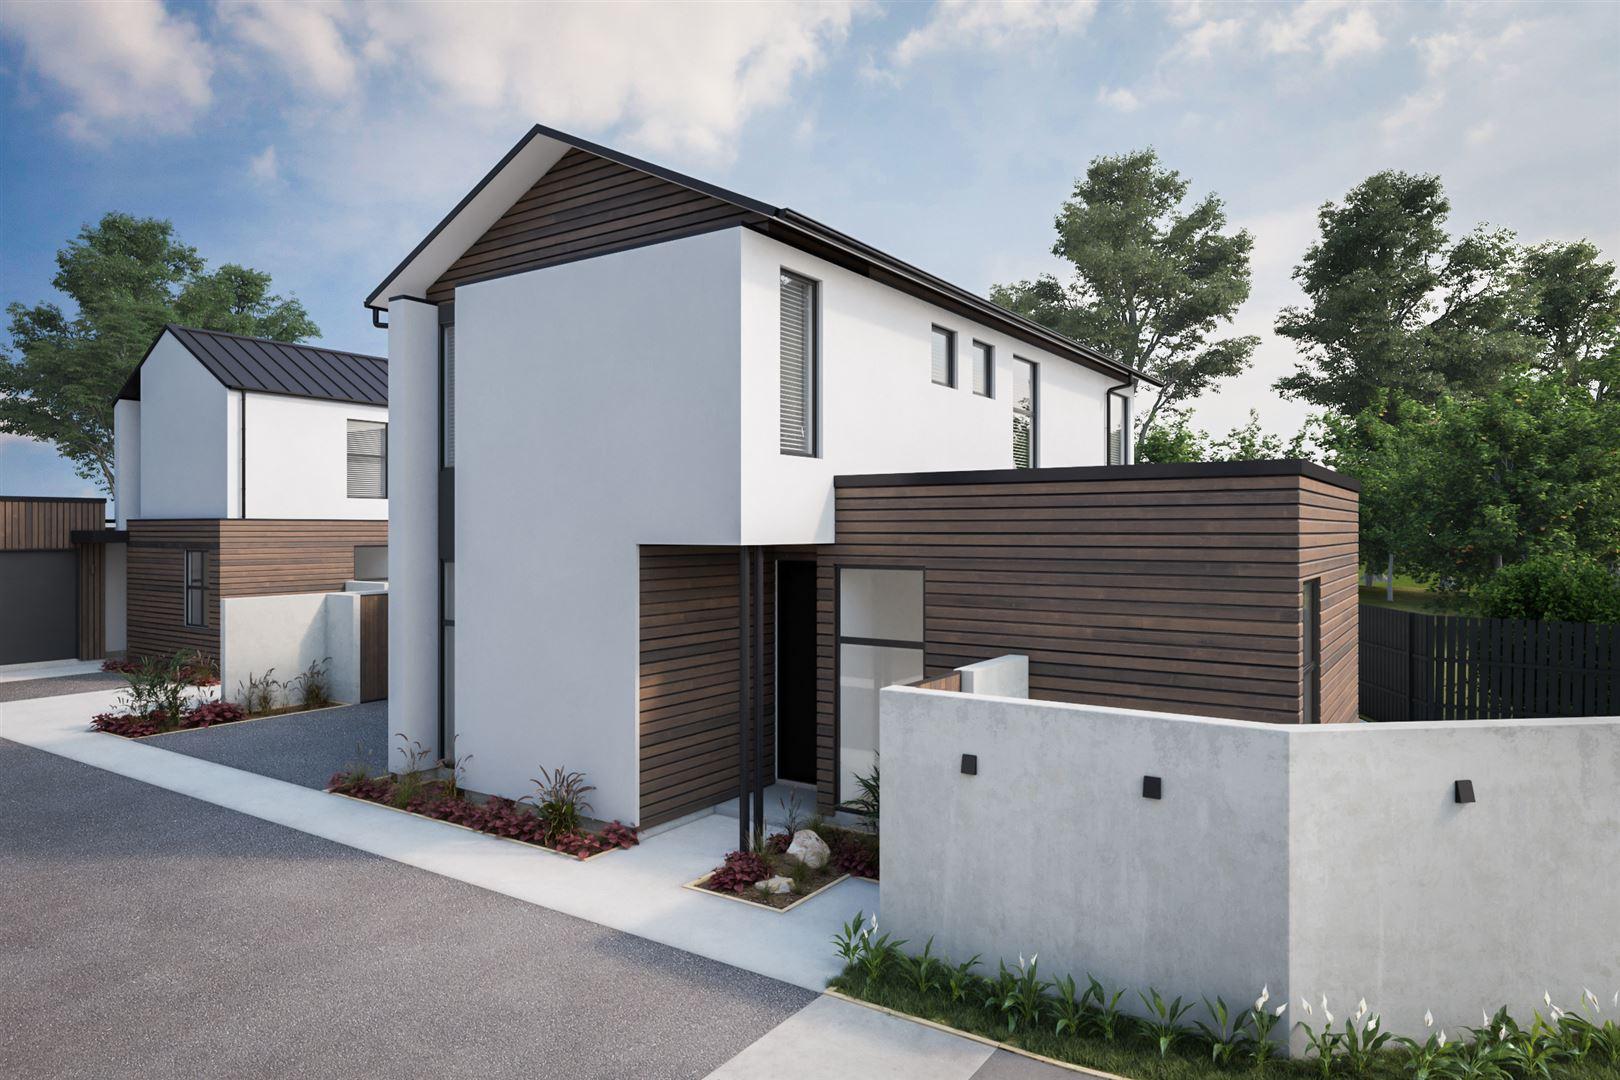 52-54 Innes Road, Merivale - Christchurch City